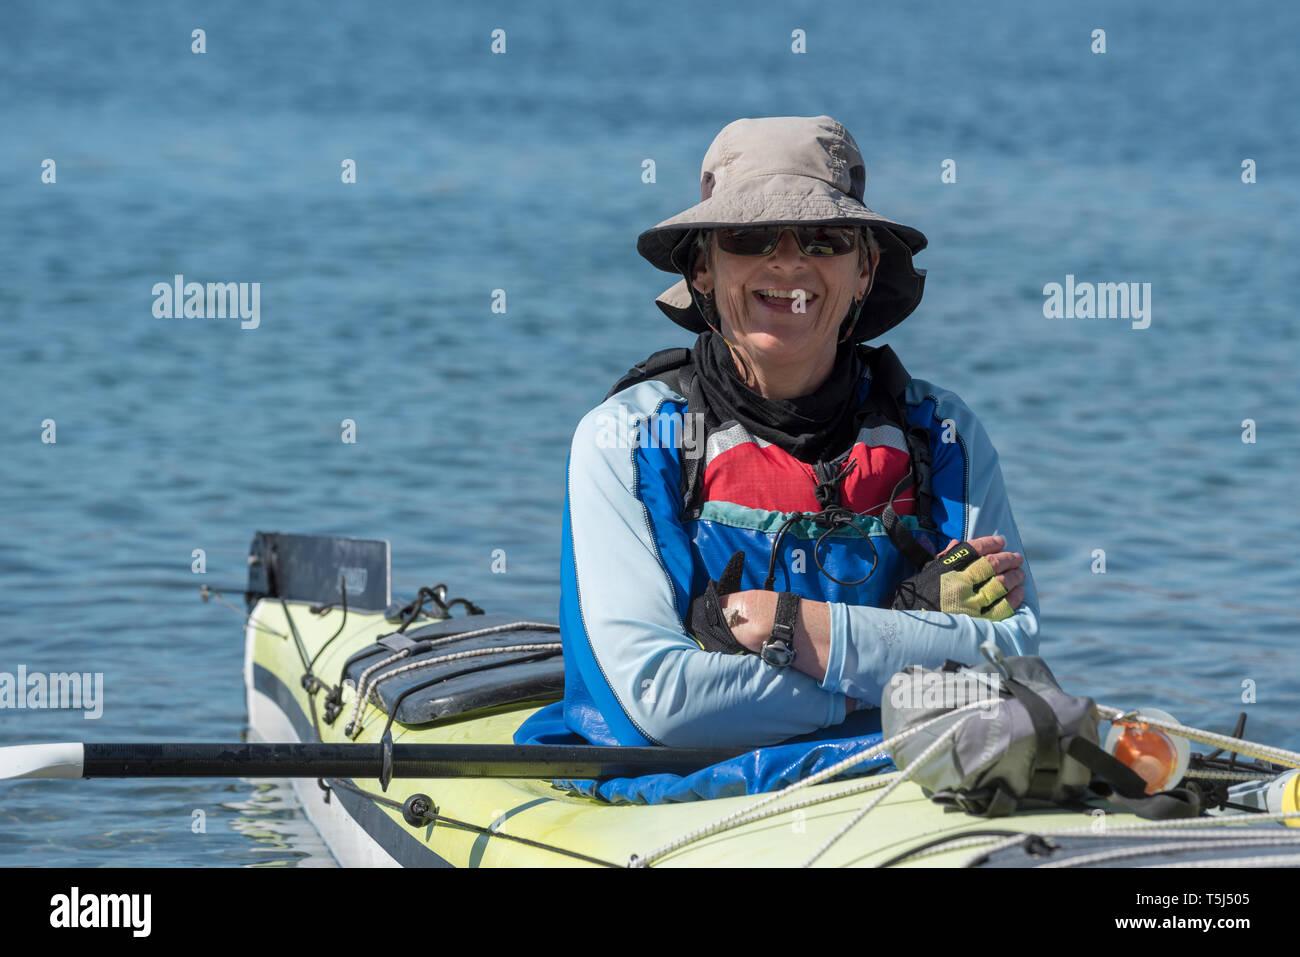 Woman sea kayaking in Bay of Loreto Nat. Park, Baja California Sur, Mexico. Stock Photo